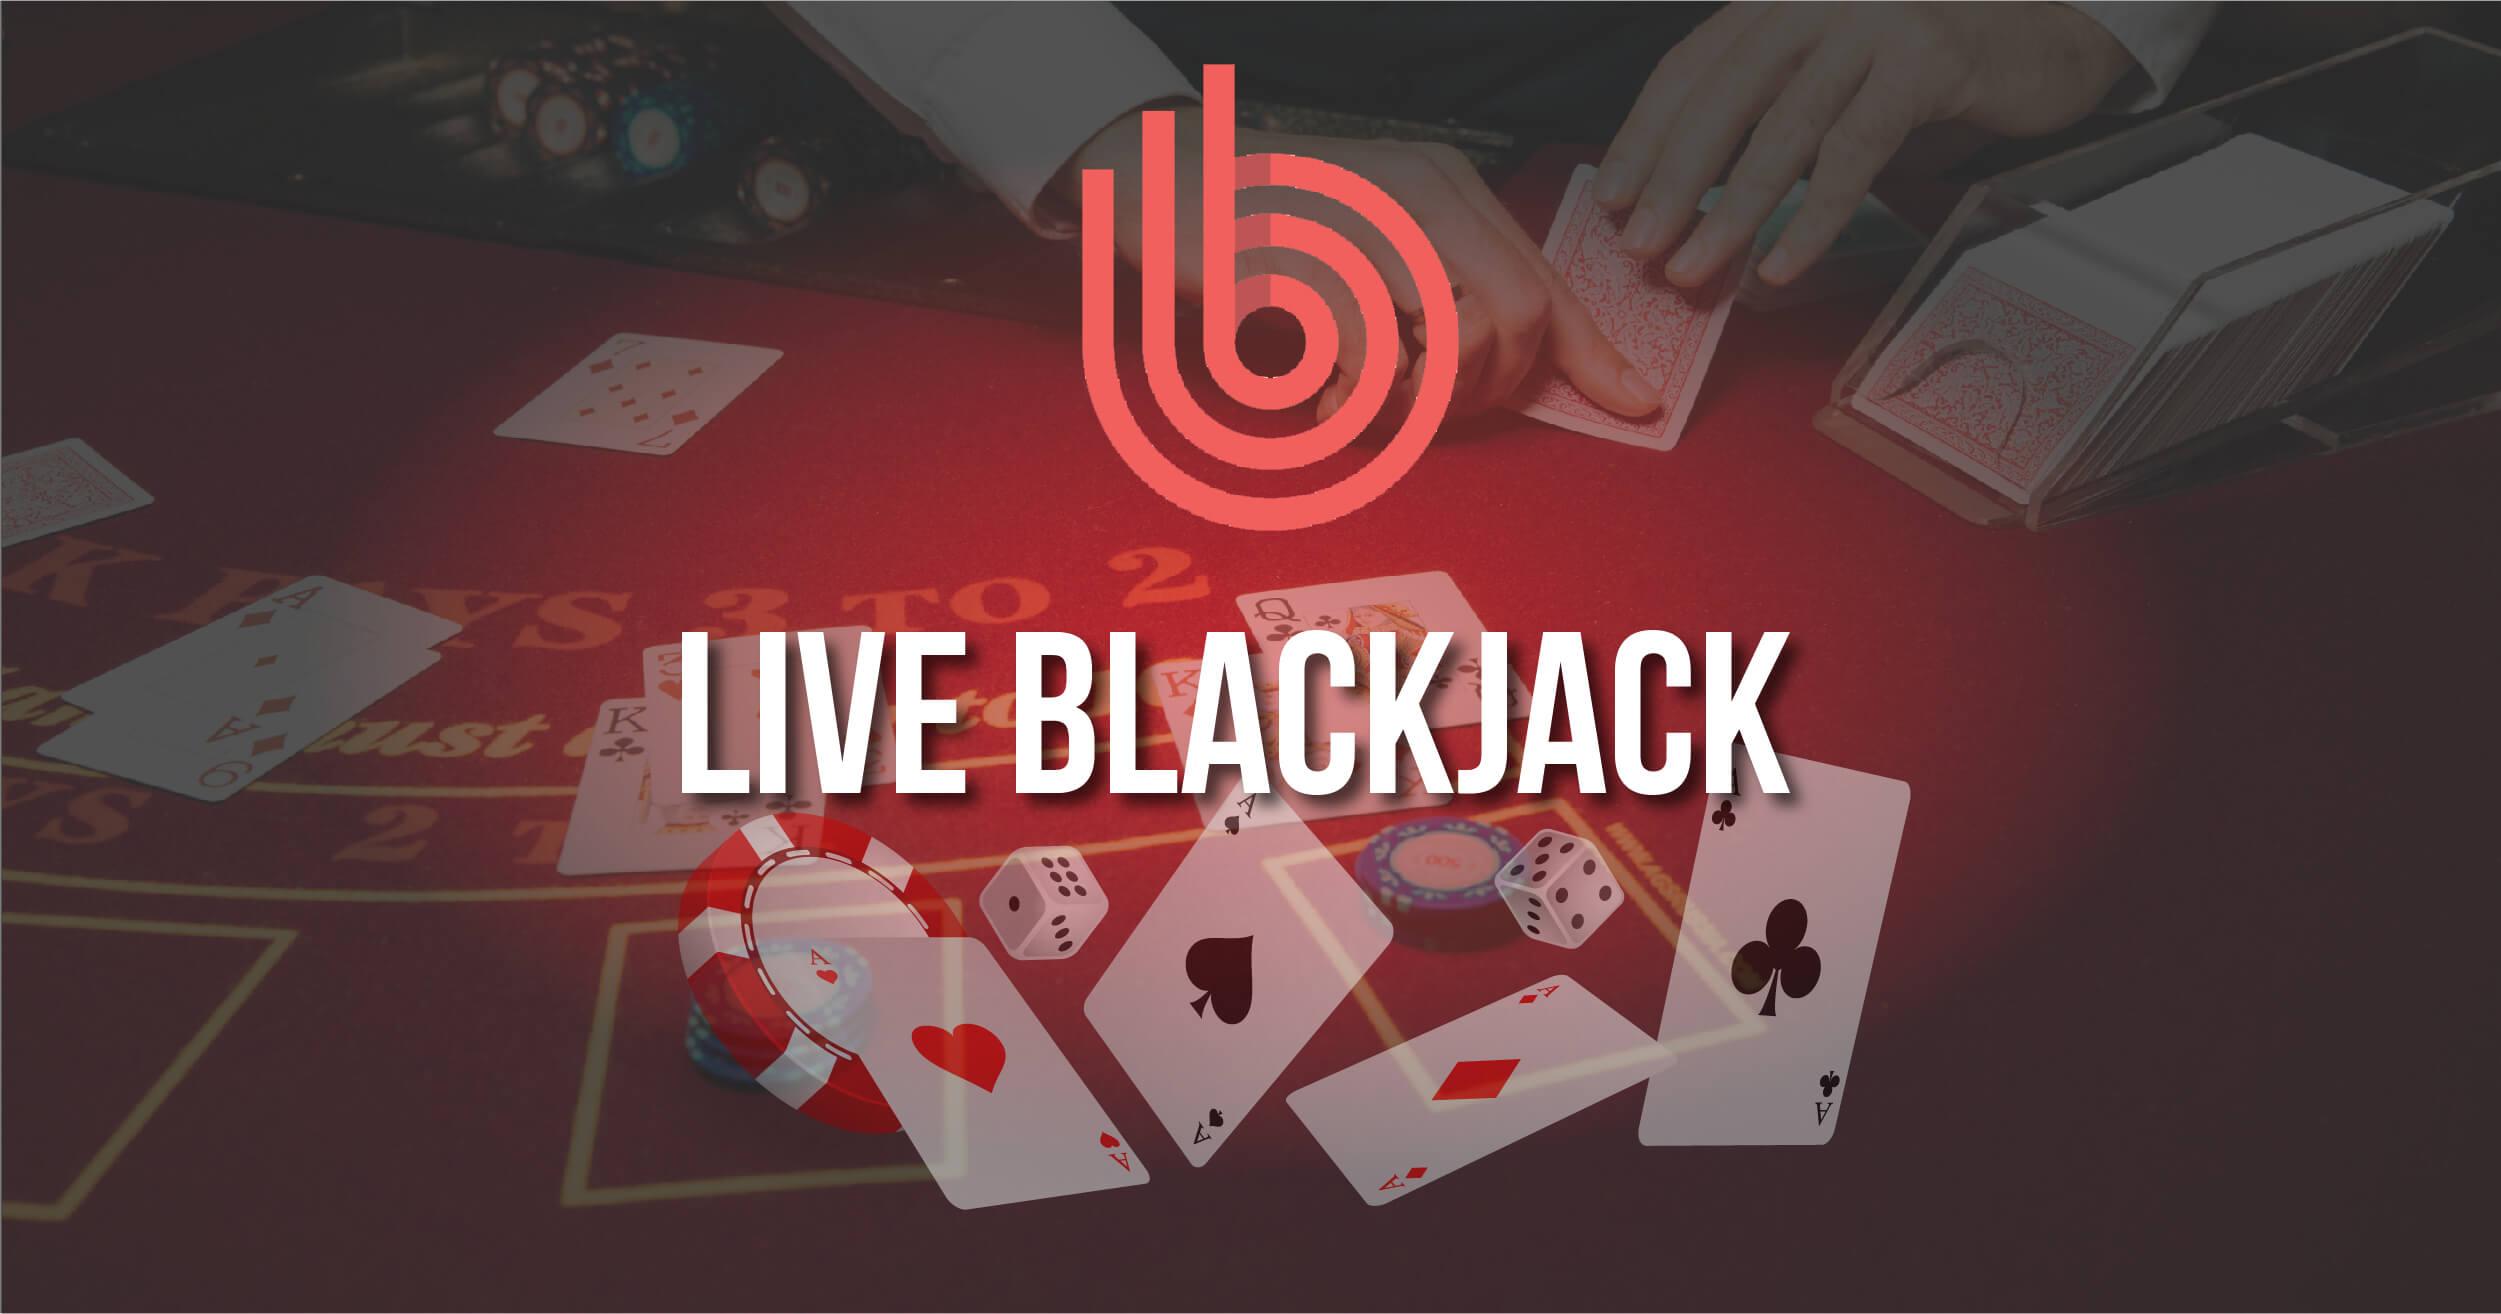 Live Blackjack Review